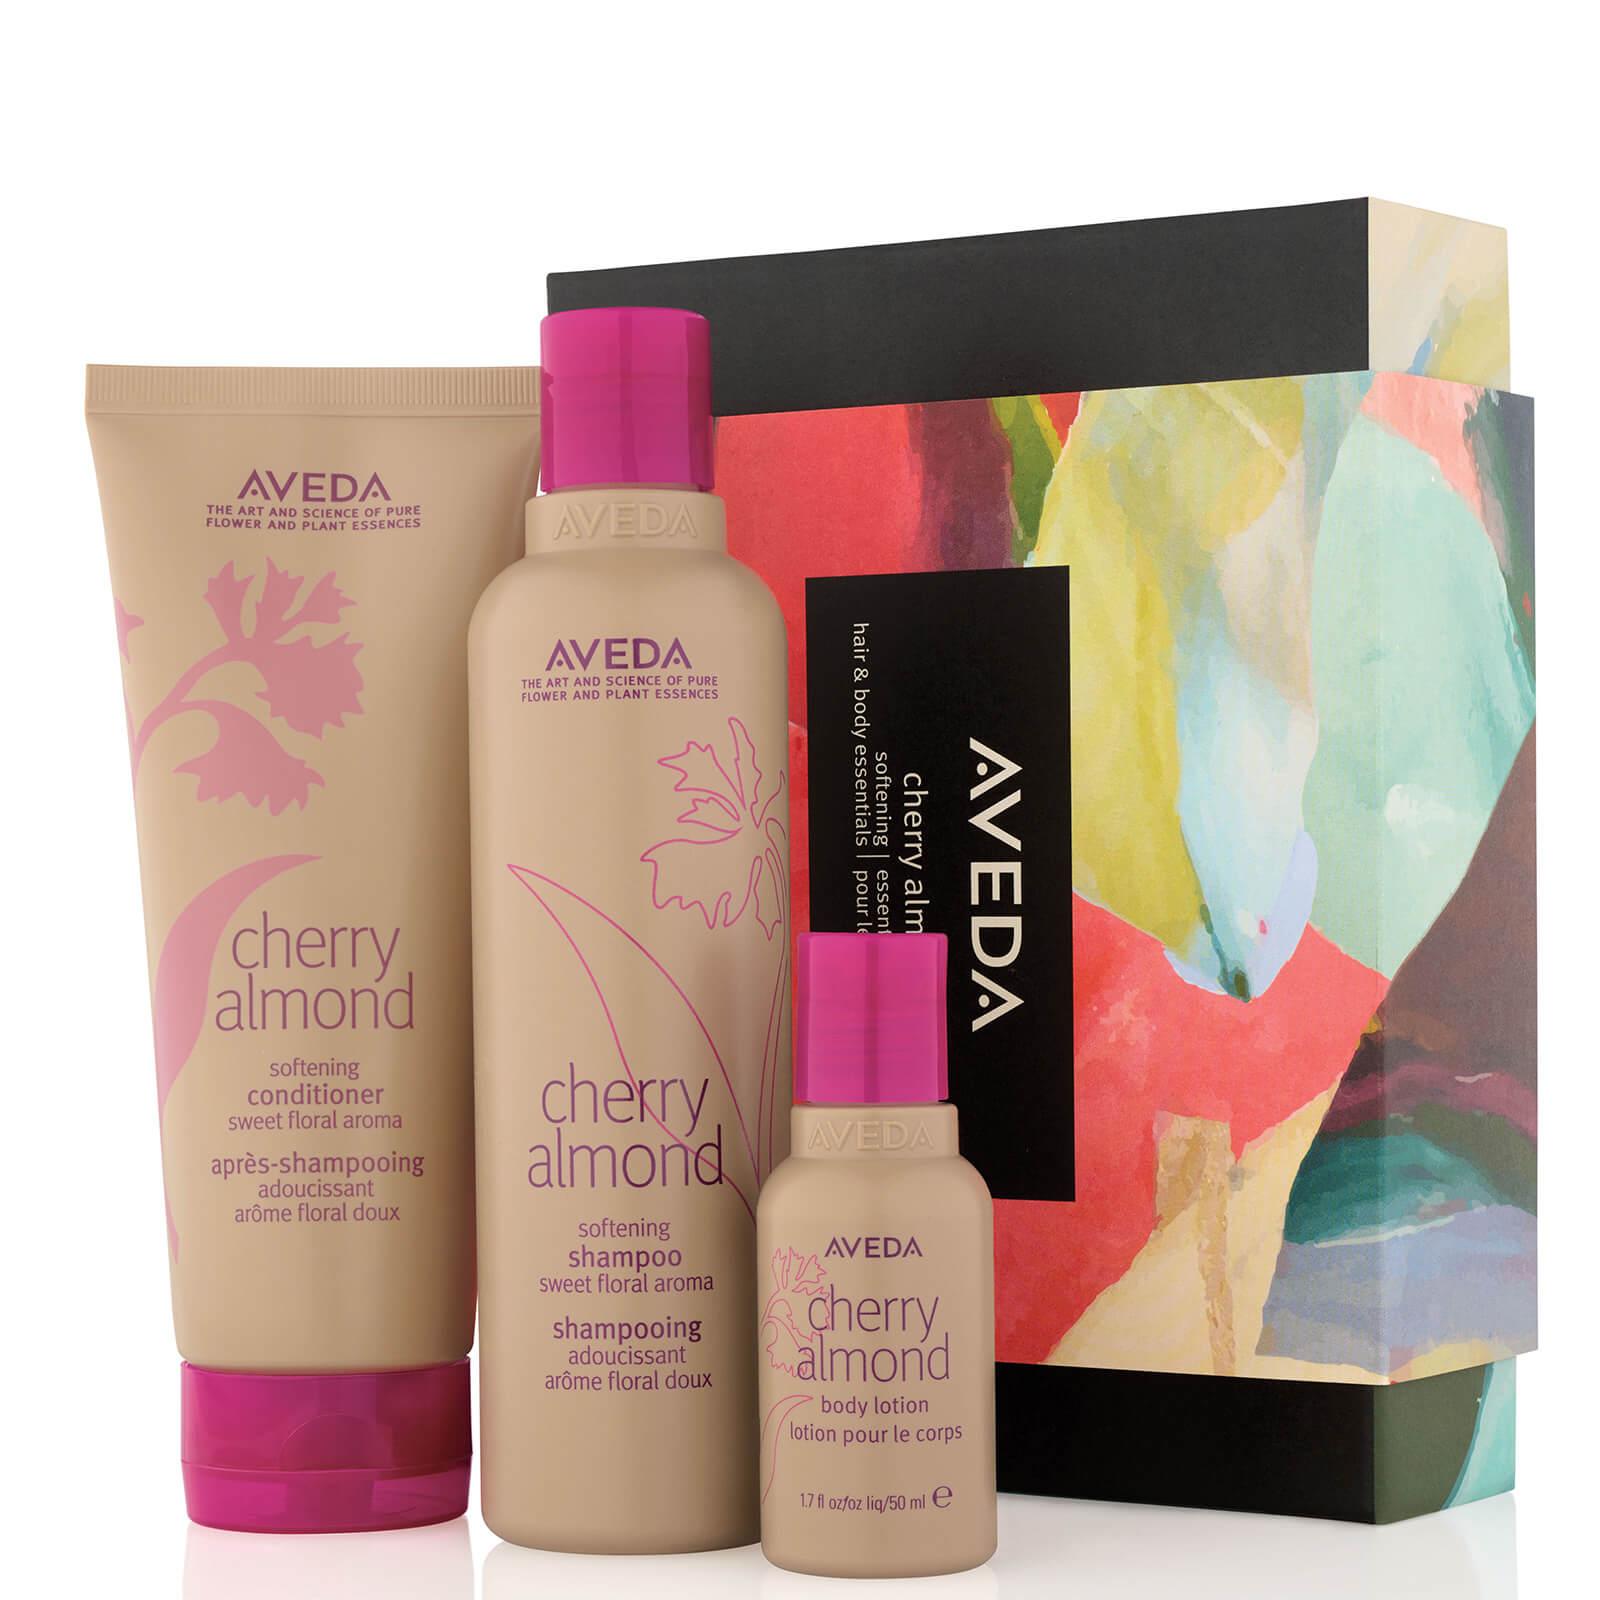 Aveda Cherry Almond Softening Hair and Body Essentials Set (Worth £44.00)